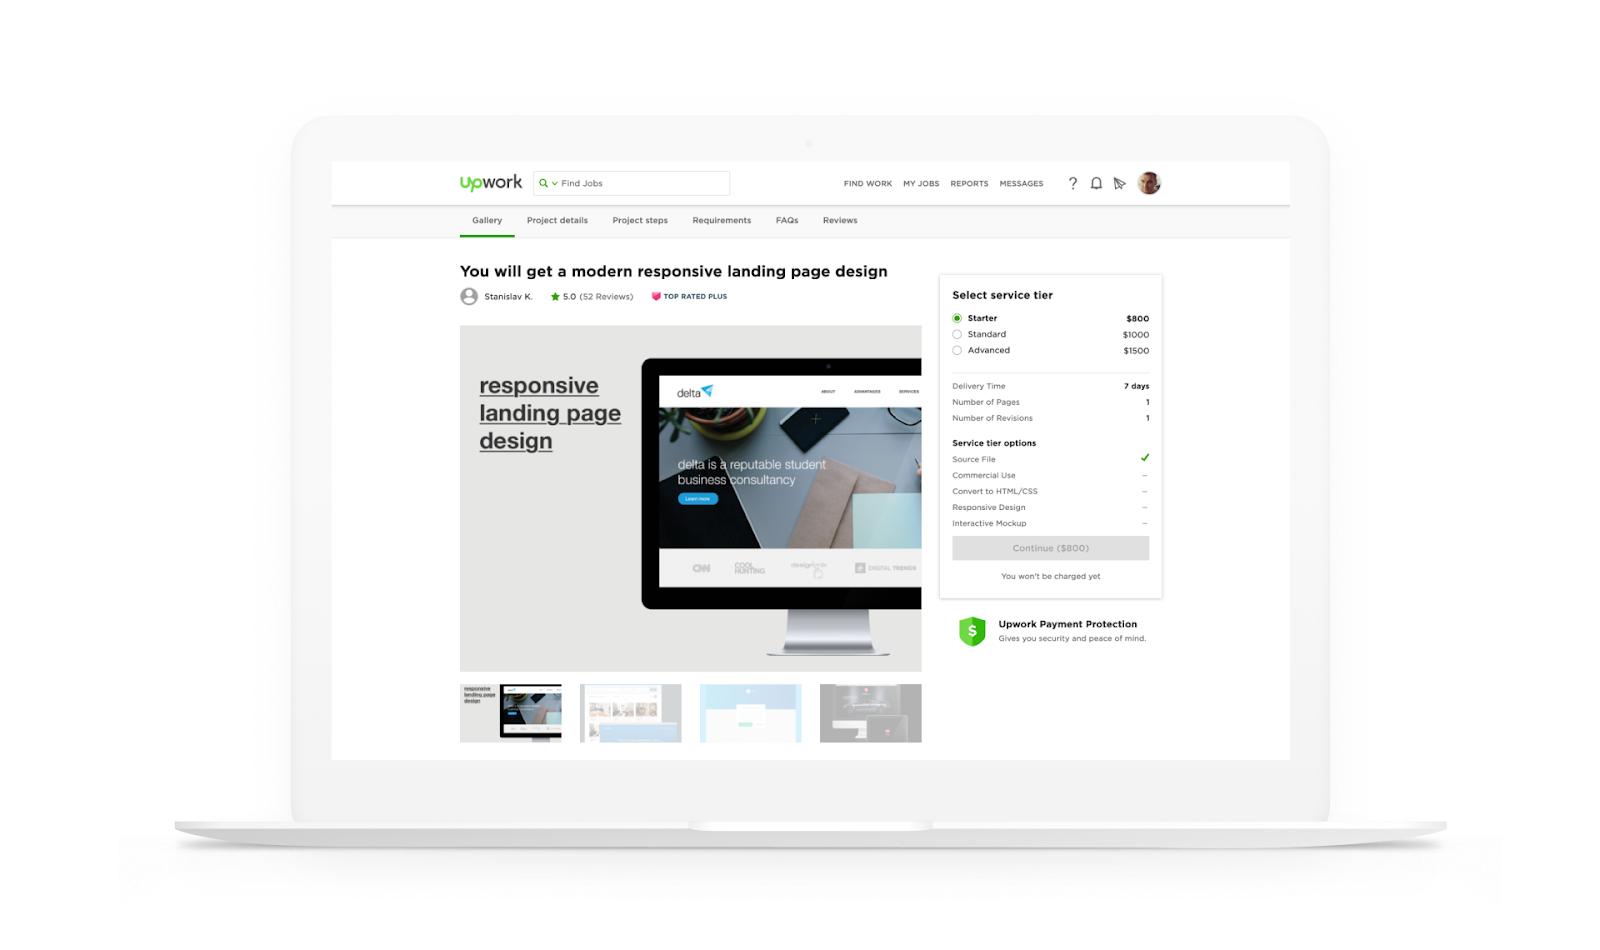 Desktop view of project scope